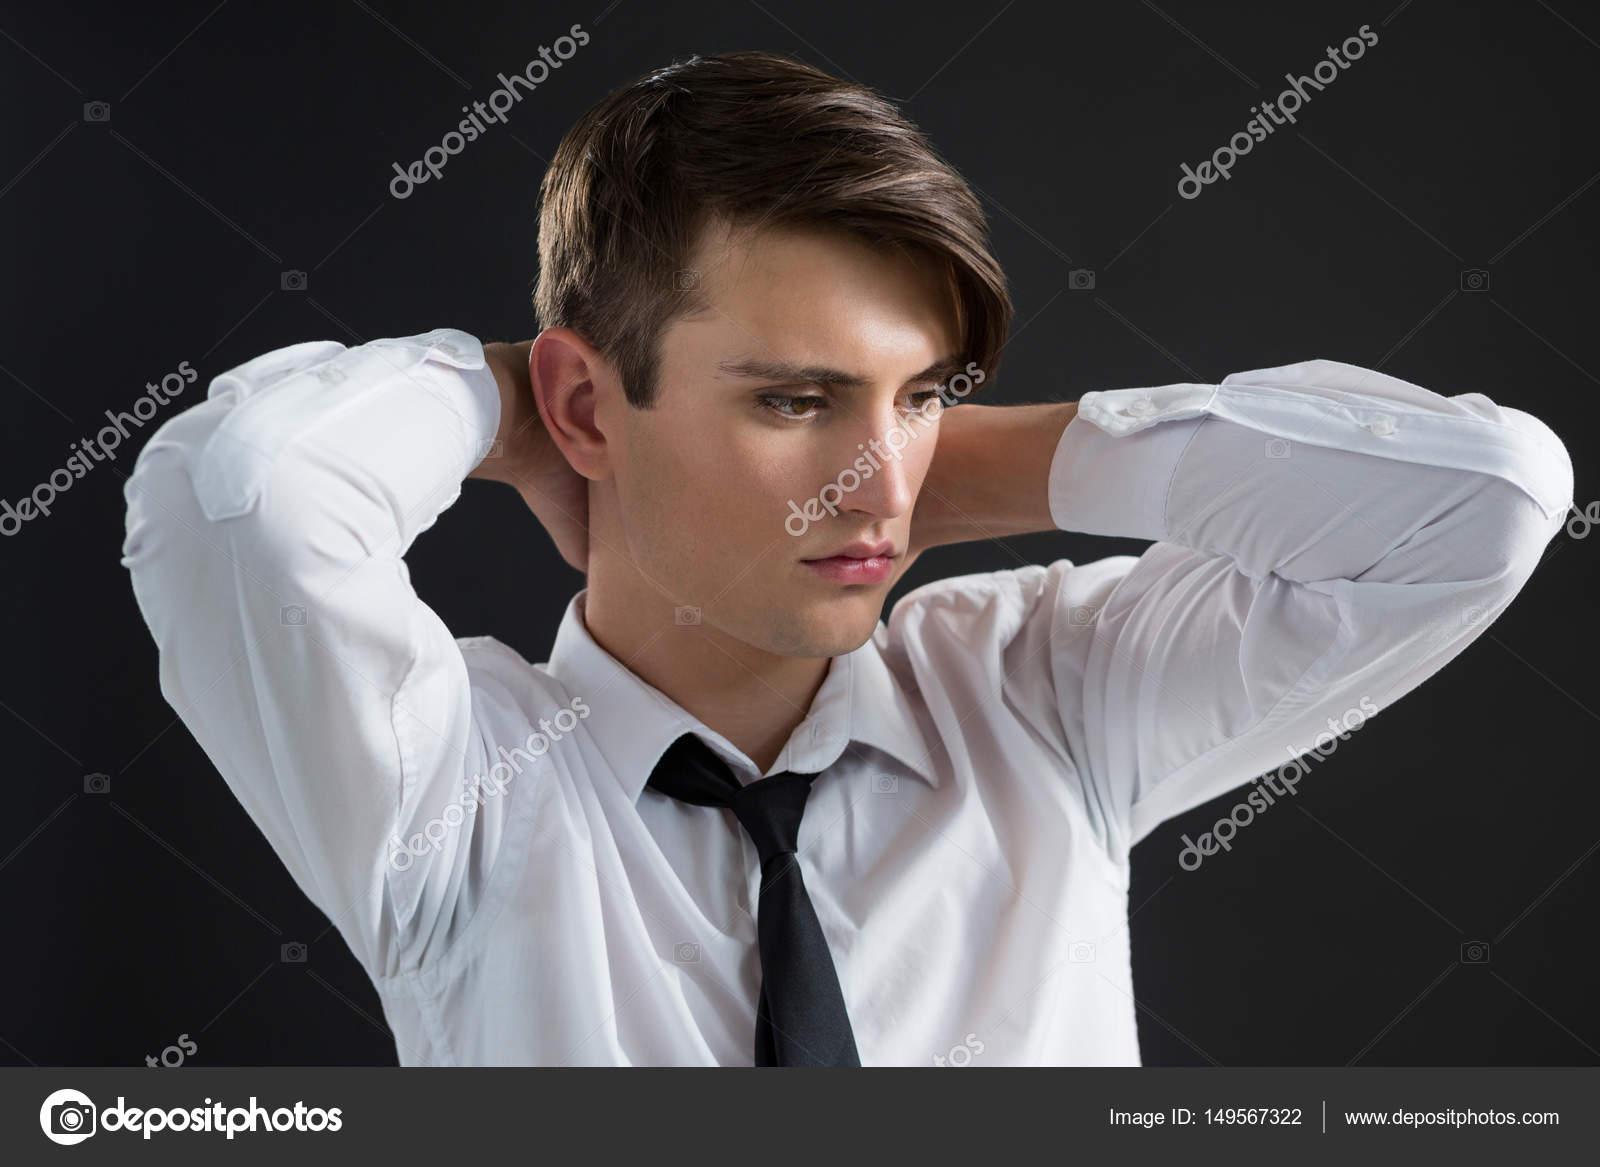 androgyne homme avec les mains sur son cou photographie wavebreakmedia 149567322. Black Bedroom Furniture Sets. Home Design Ideas